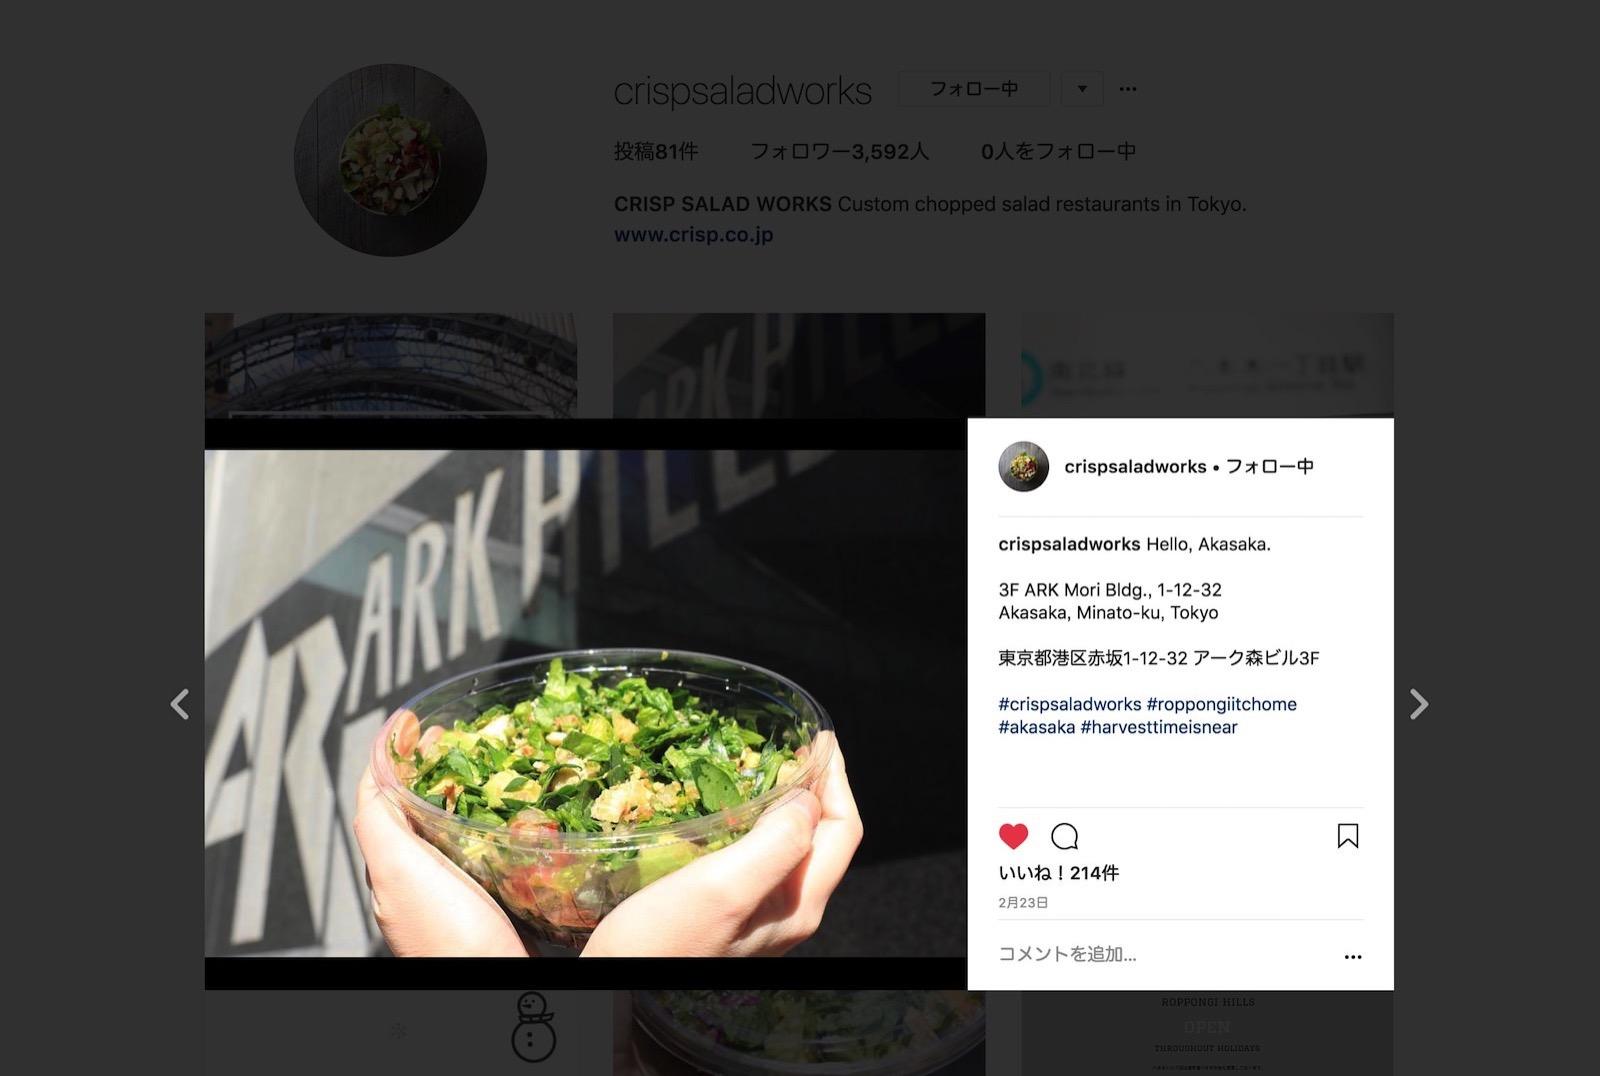 Crisp Salad Works Akasaka